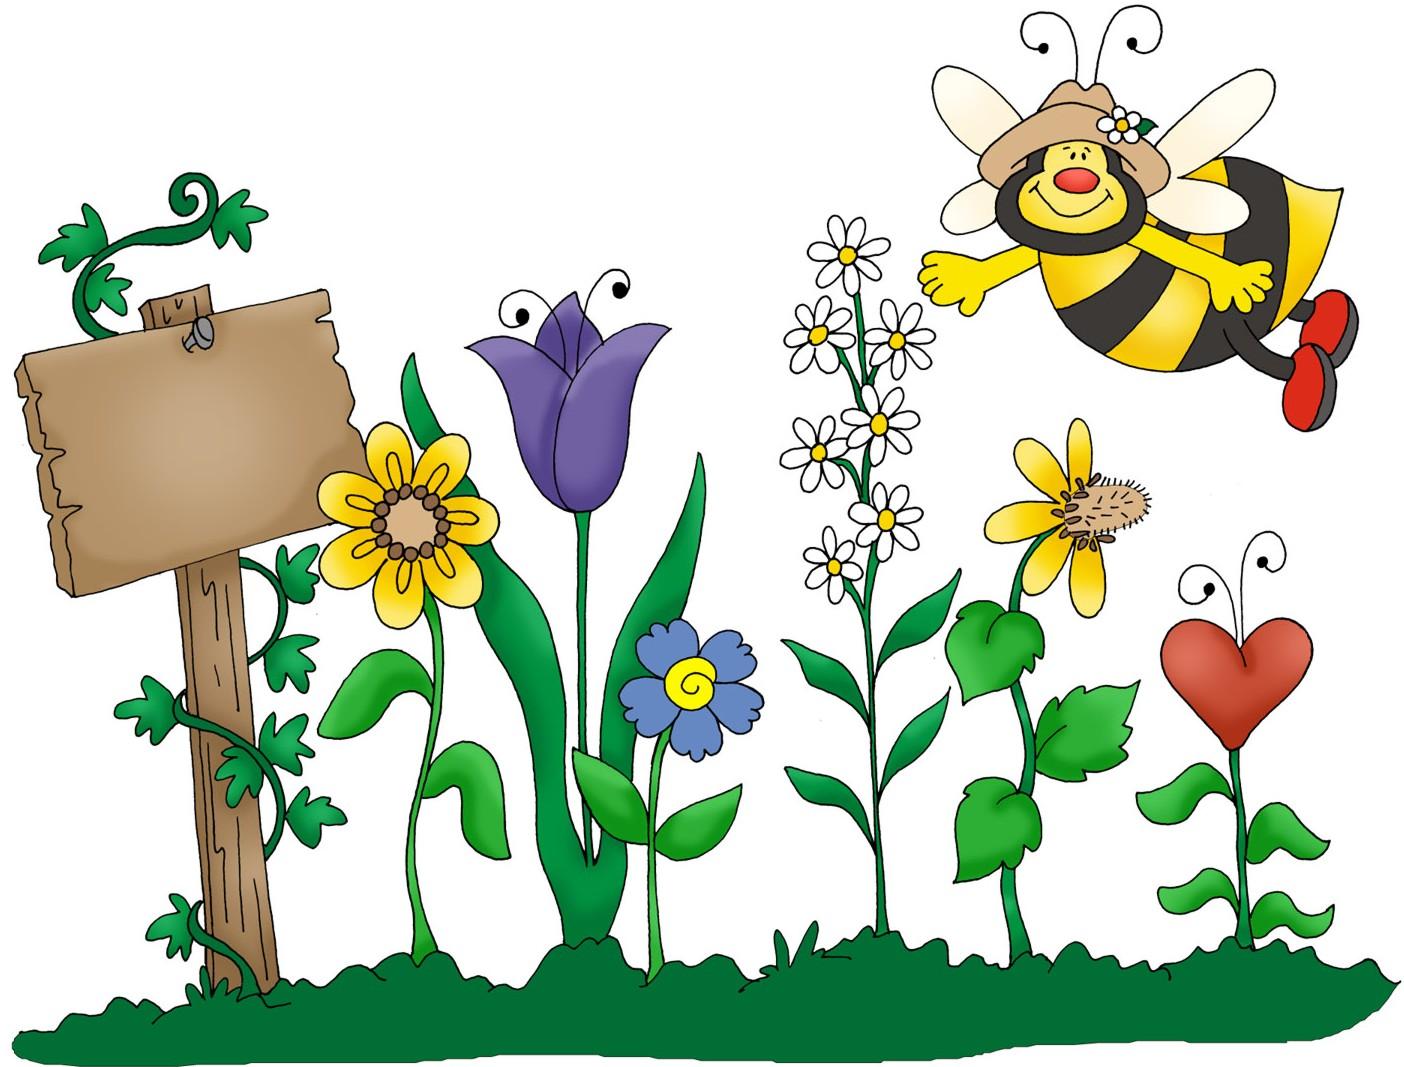 Spring garden clipart free clipart image-Spring garden clipart free clipart image the cliparts-14